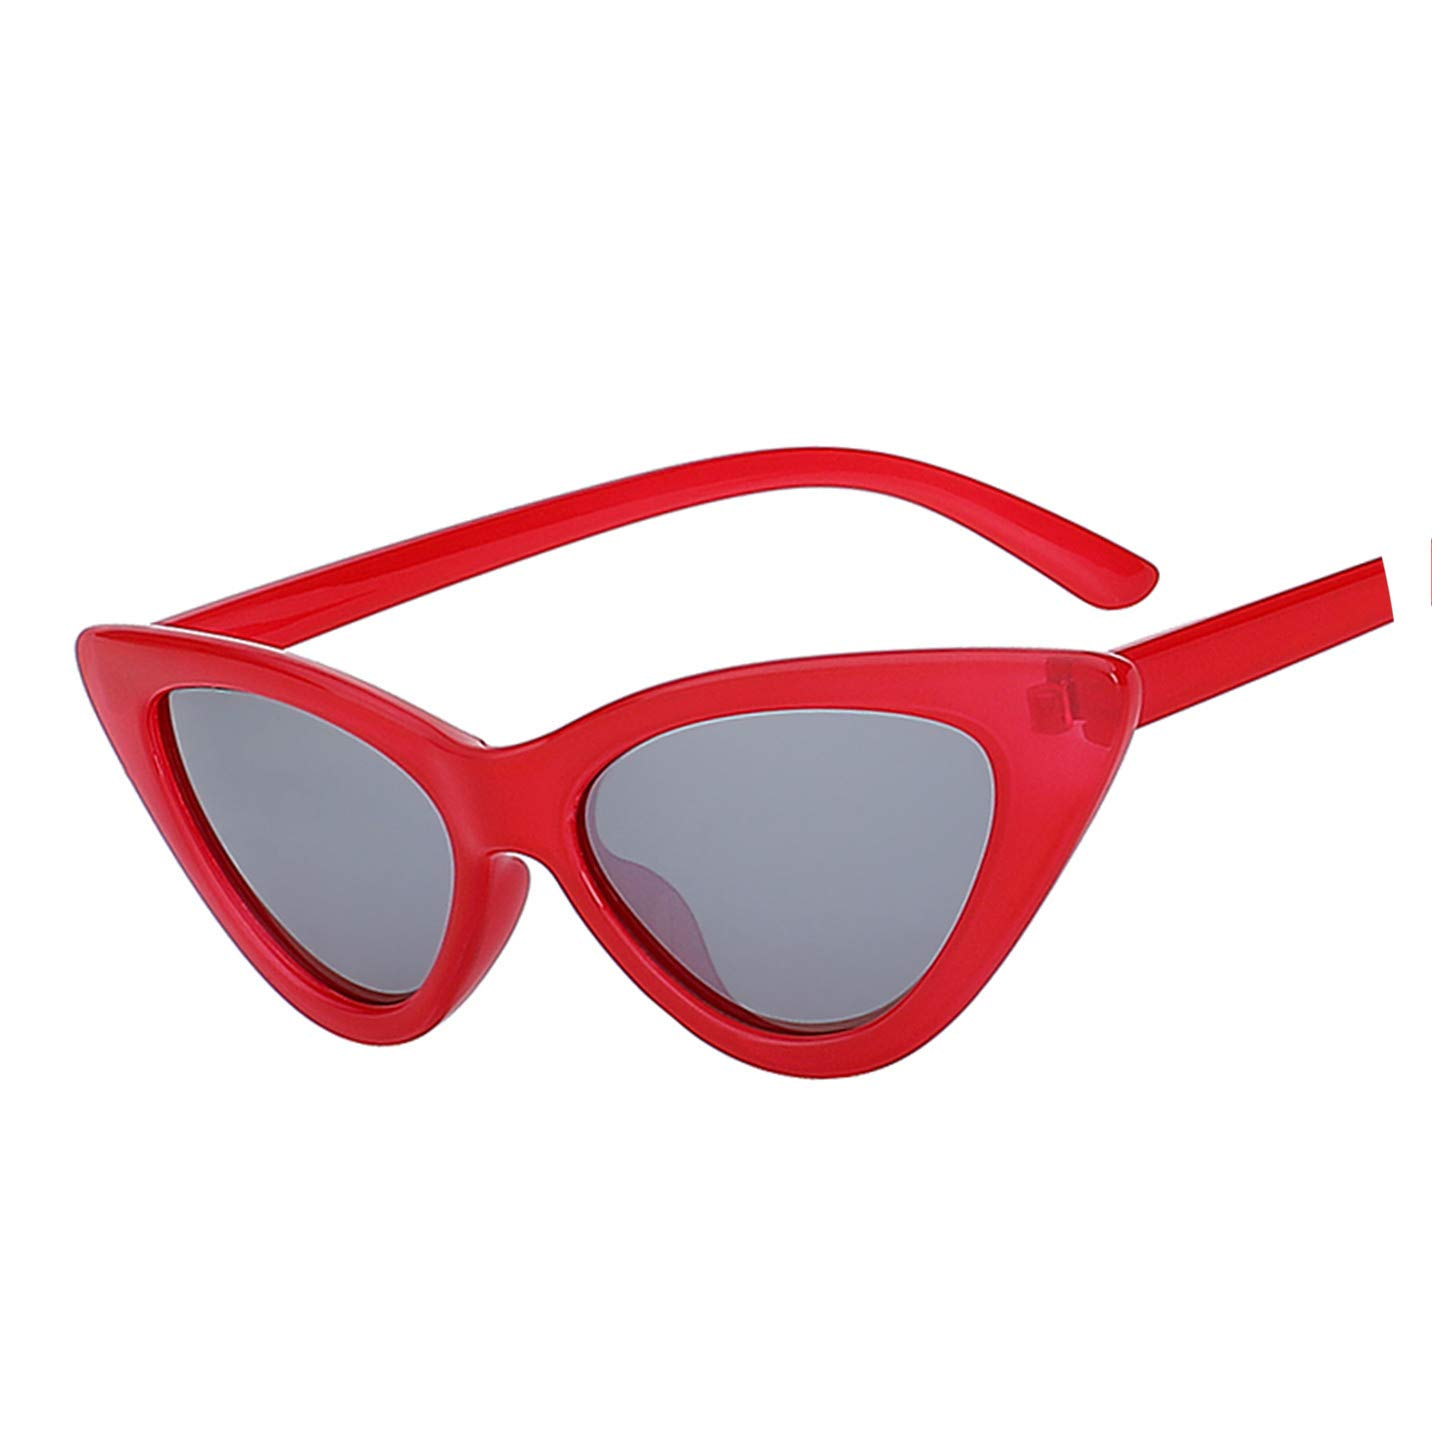 Amazon.com: Women Fashion Glasses Brand Design Sunglasses ...